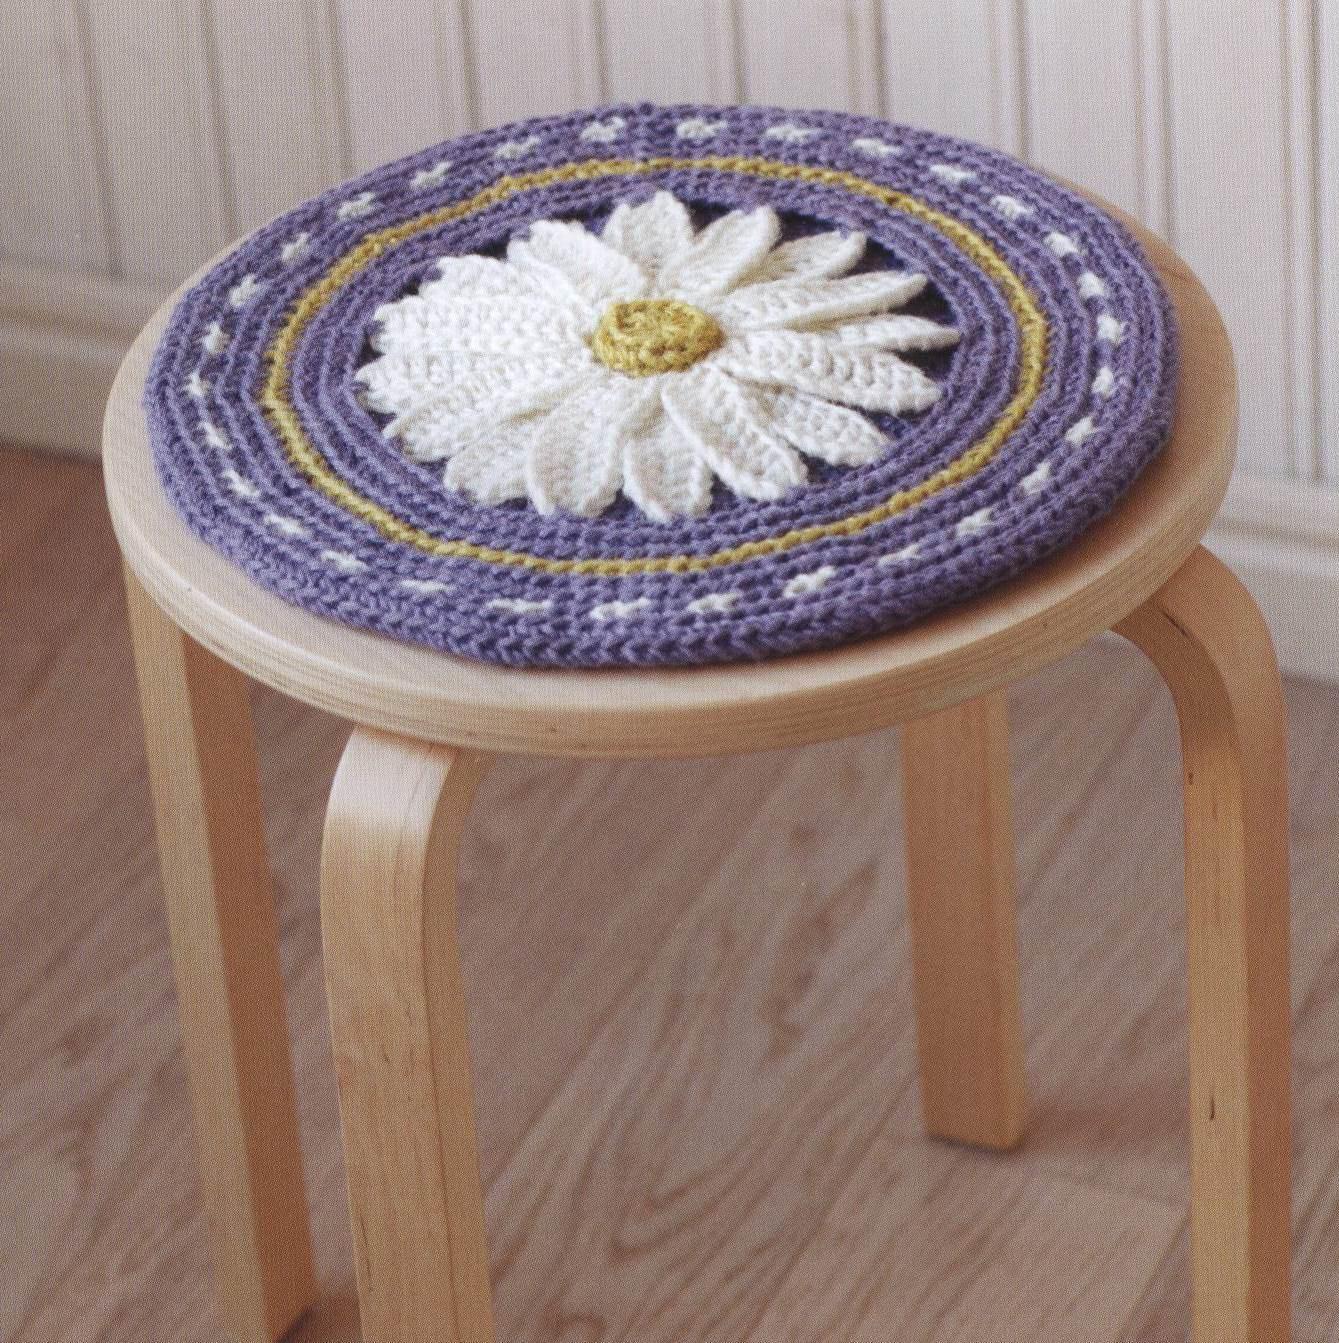 0011_Asahi Crochet Lace (11)